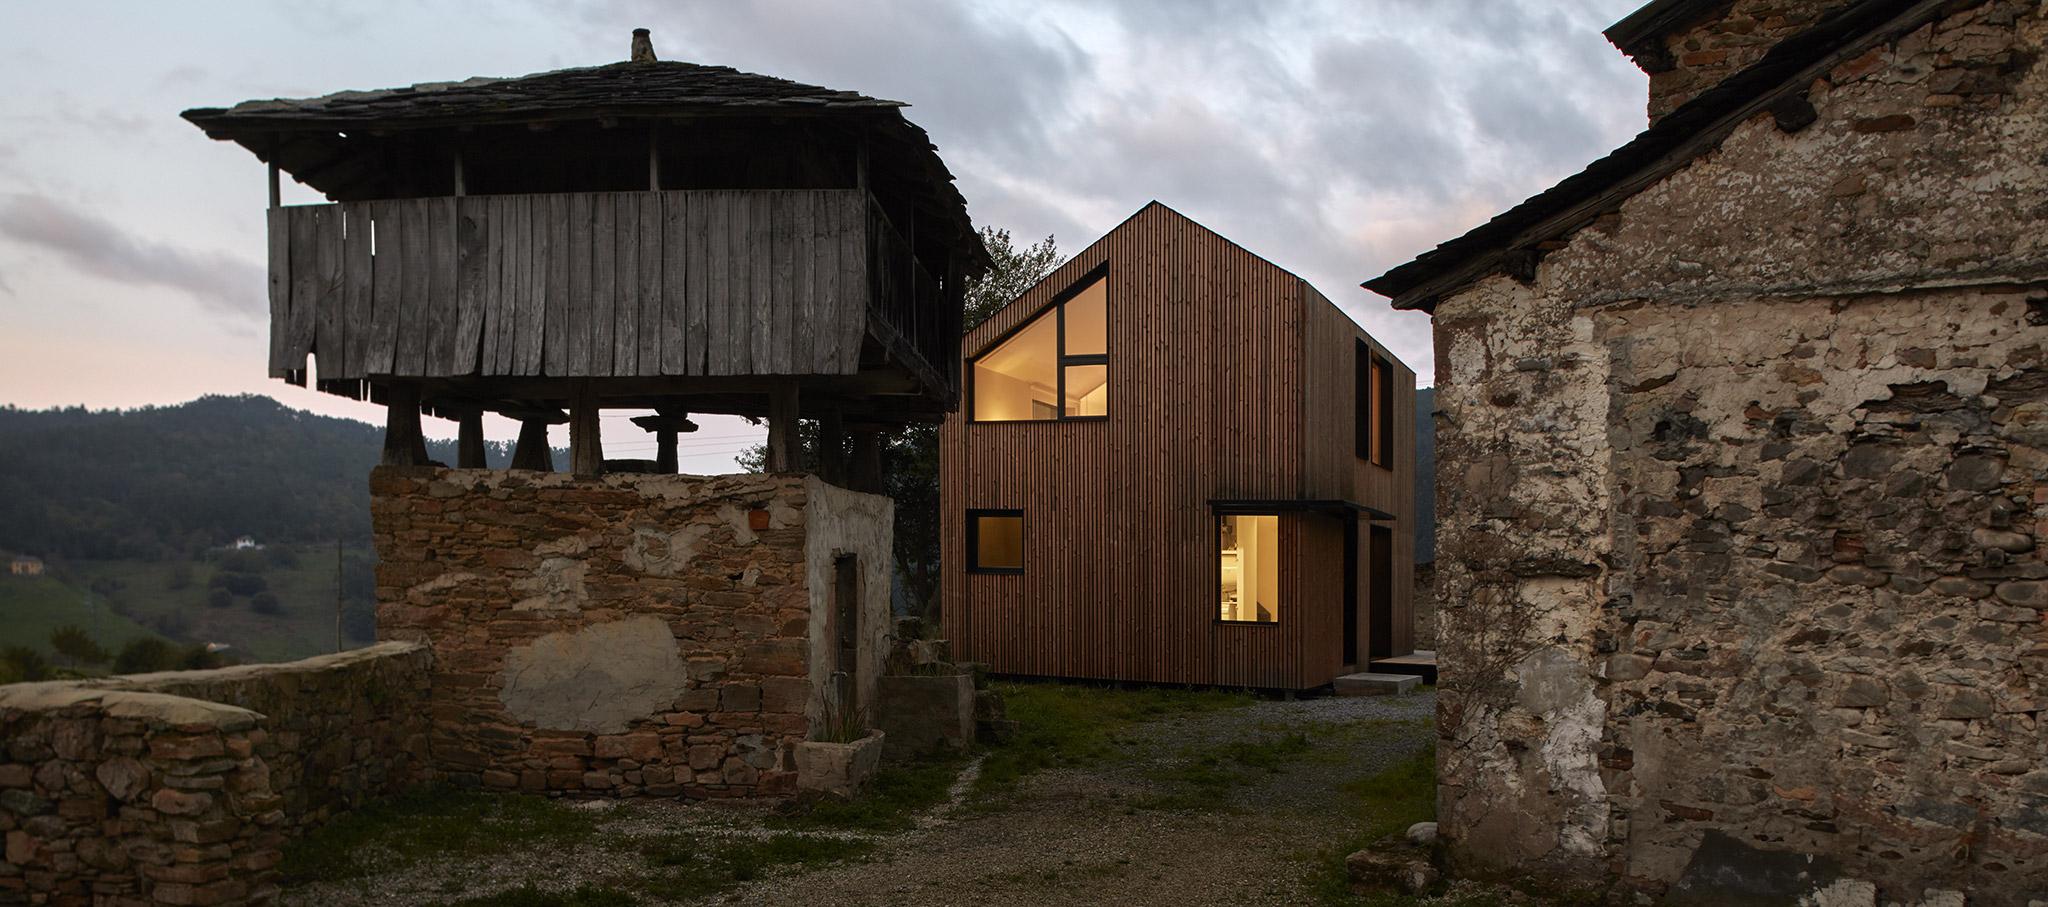 Casa Montaña por [baragaño], Váldes, Asturias. Fotografía © Mariela Apollonio